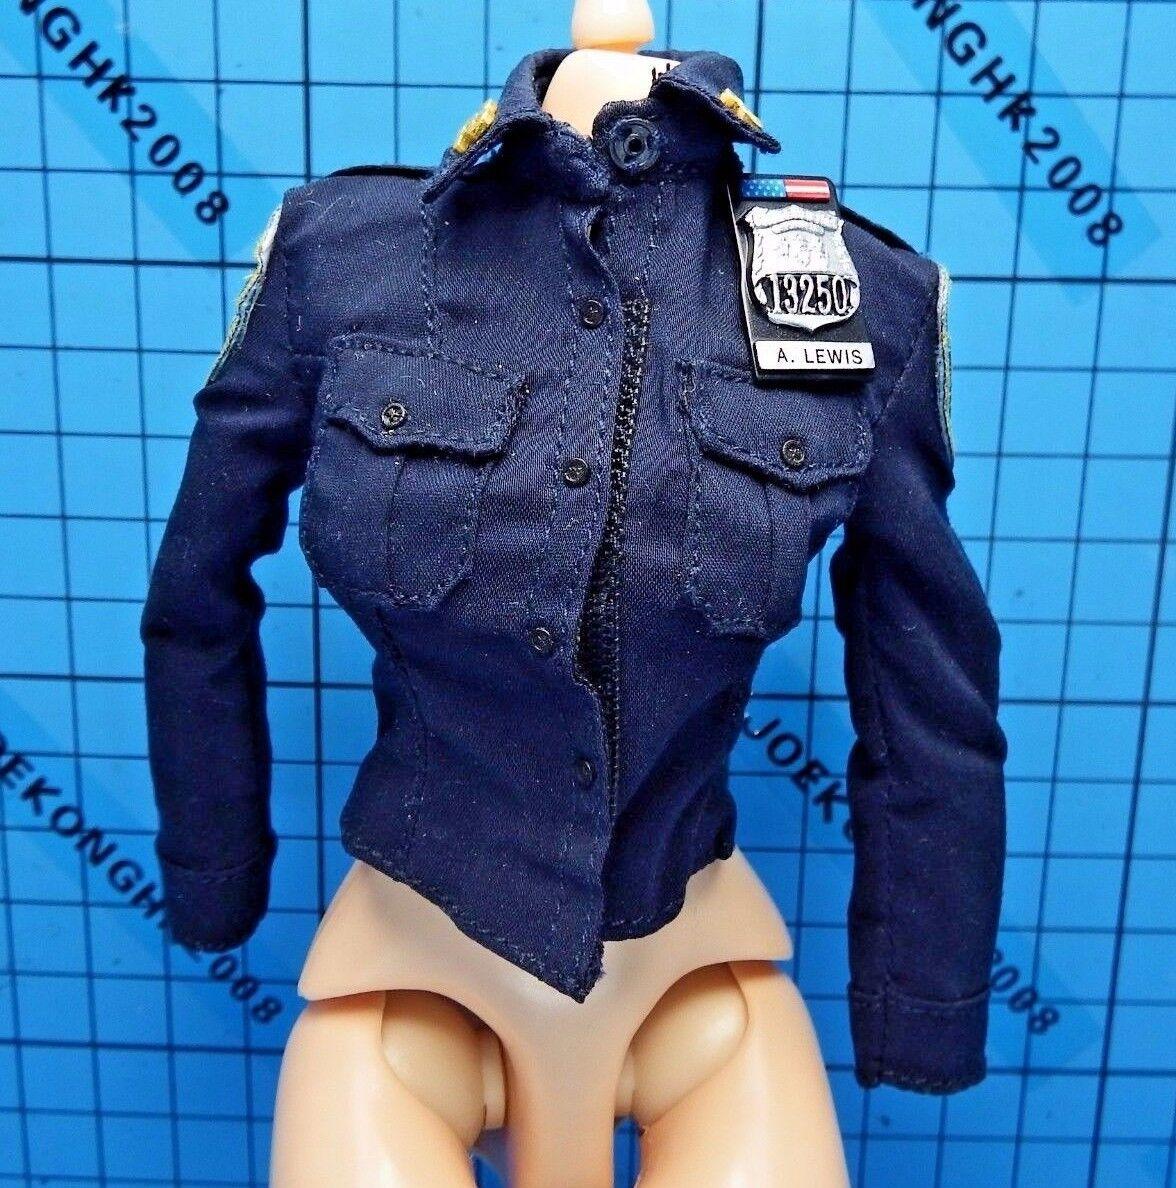 Dam Toys 1 6 GKS003 Gangsters Kingdom Officer A. Lewis Figure - Shirt + Badge